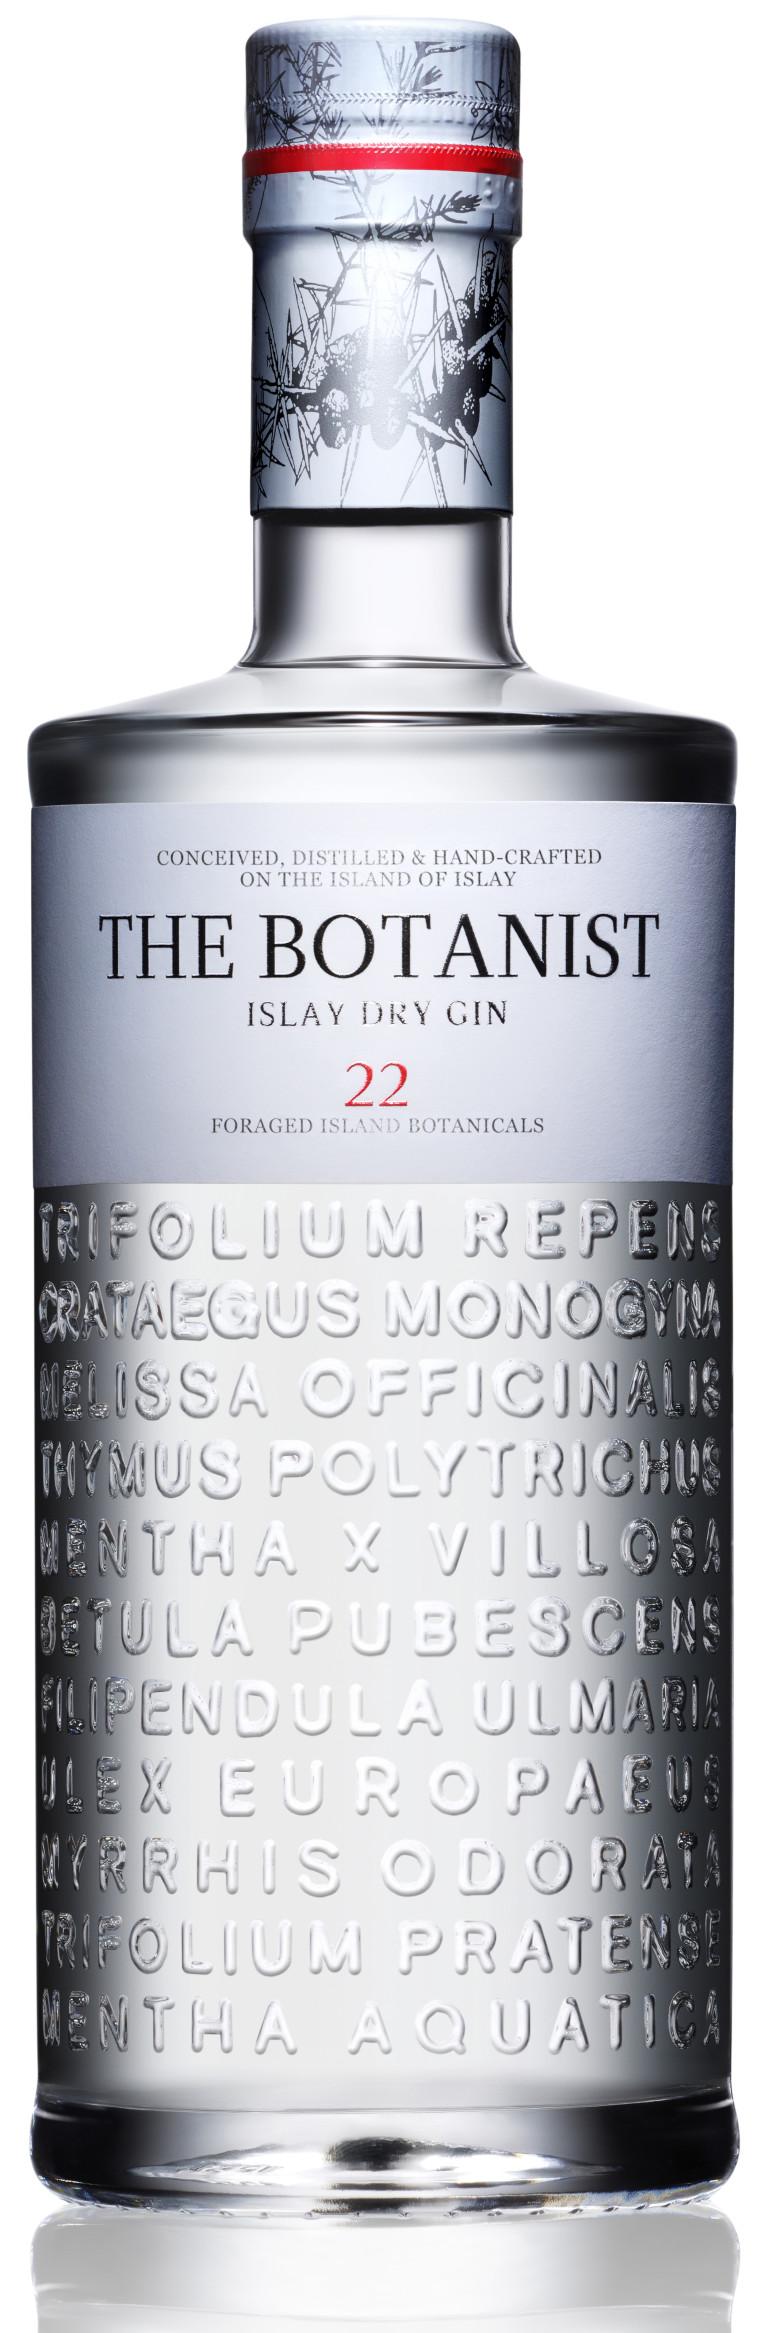 ג'ין The botanist (צילום: יח''צ)